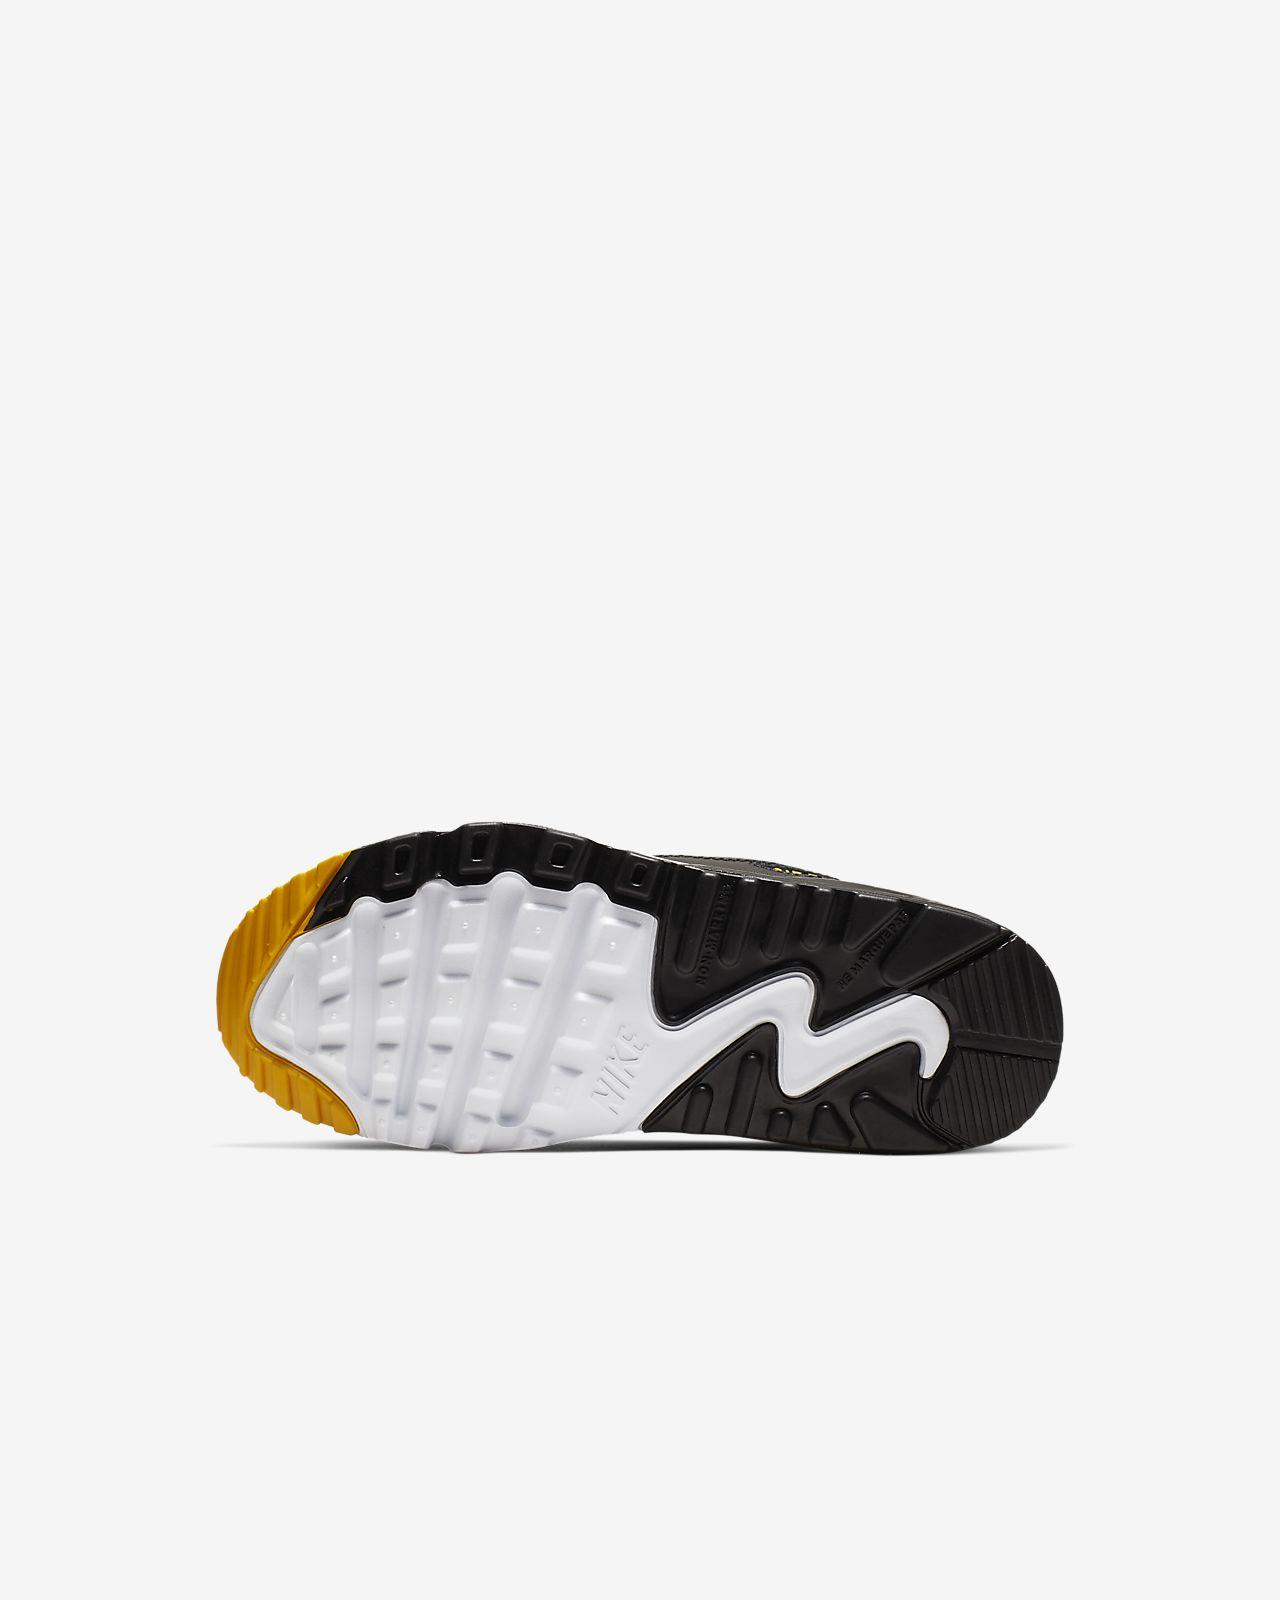 NIKE Air Max 90 Leather Sneakers Negro Niño Niños 9 16 Años